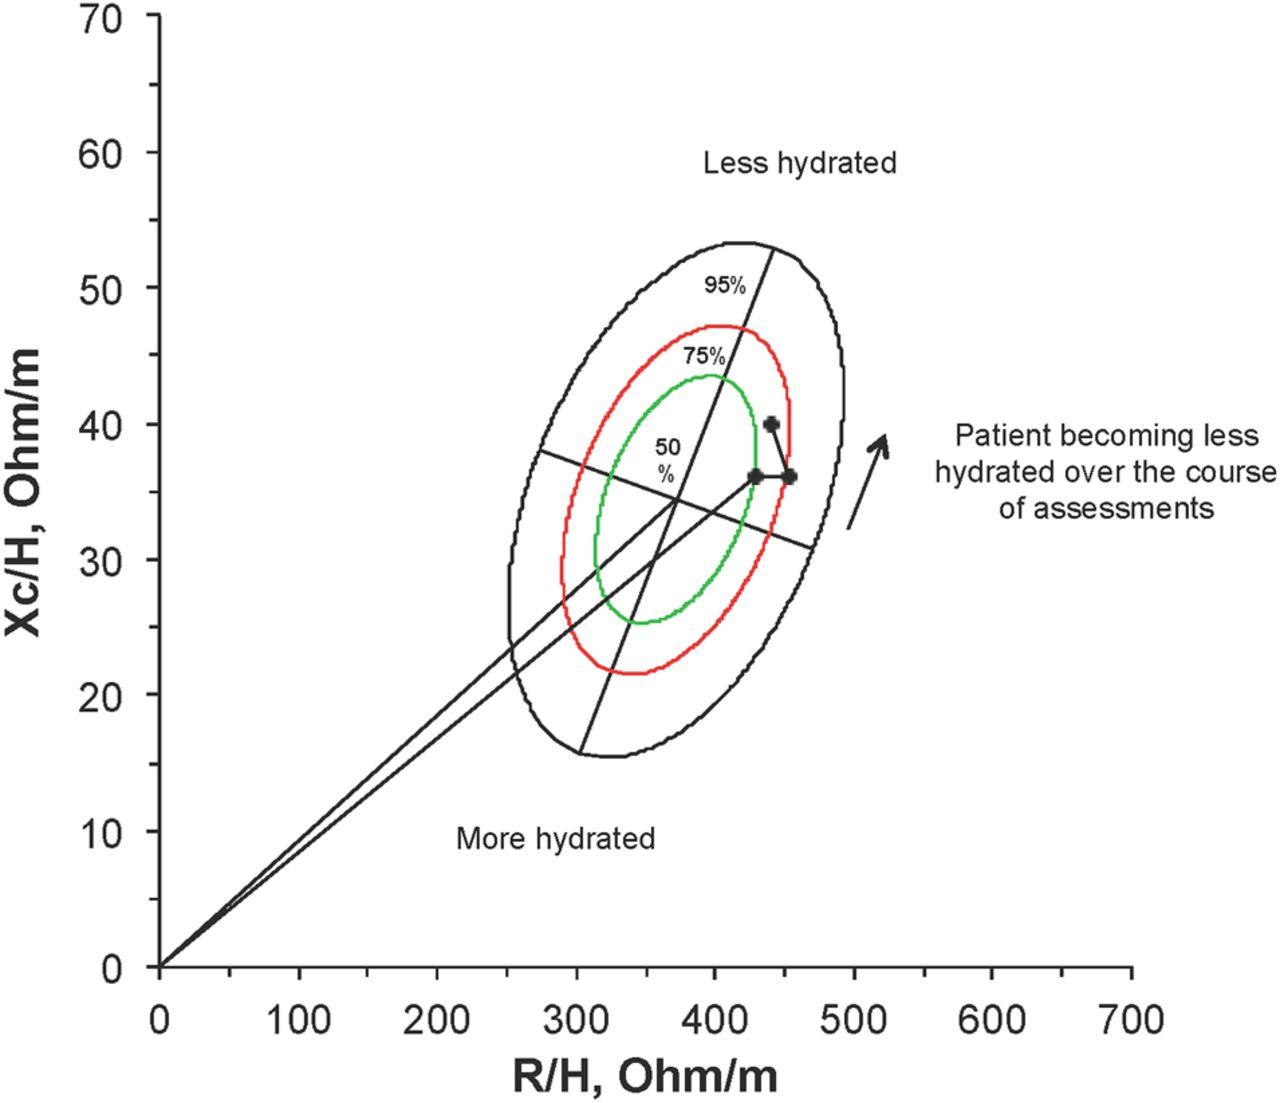 Longitudinal bioimpedance assessments to evaluate